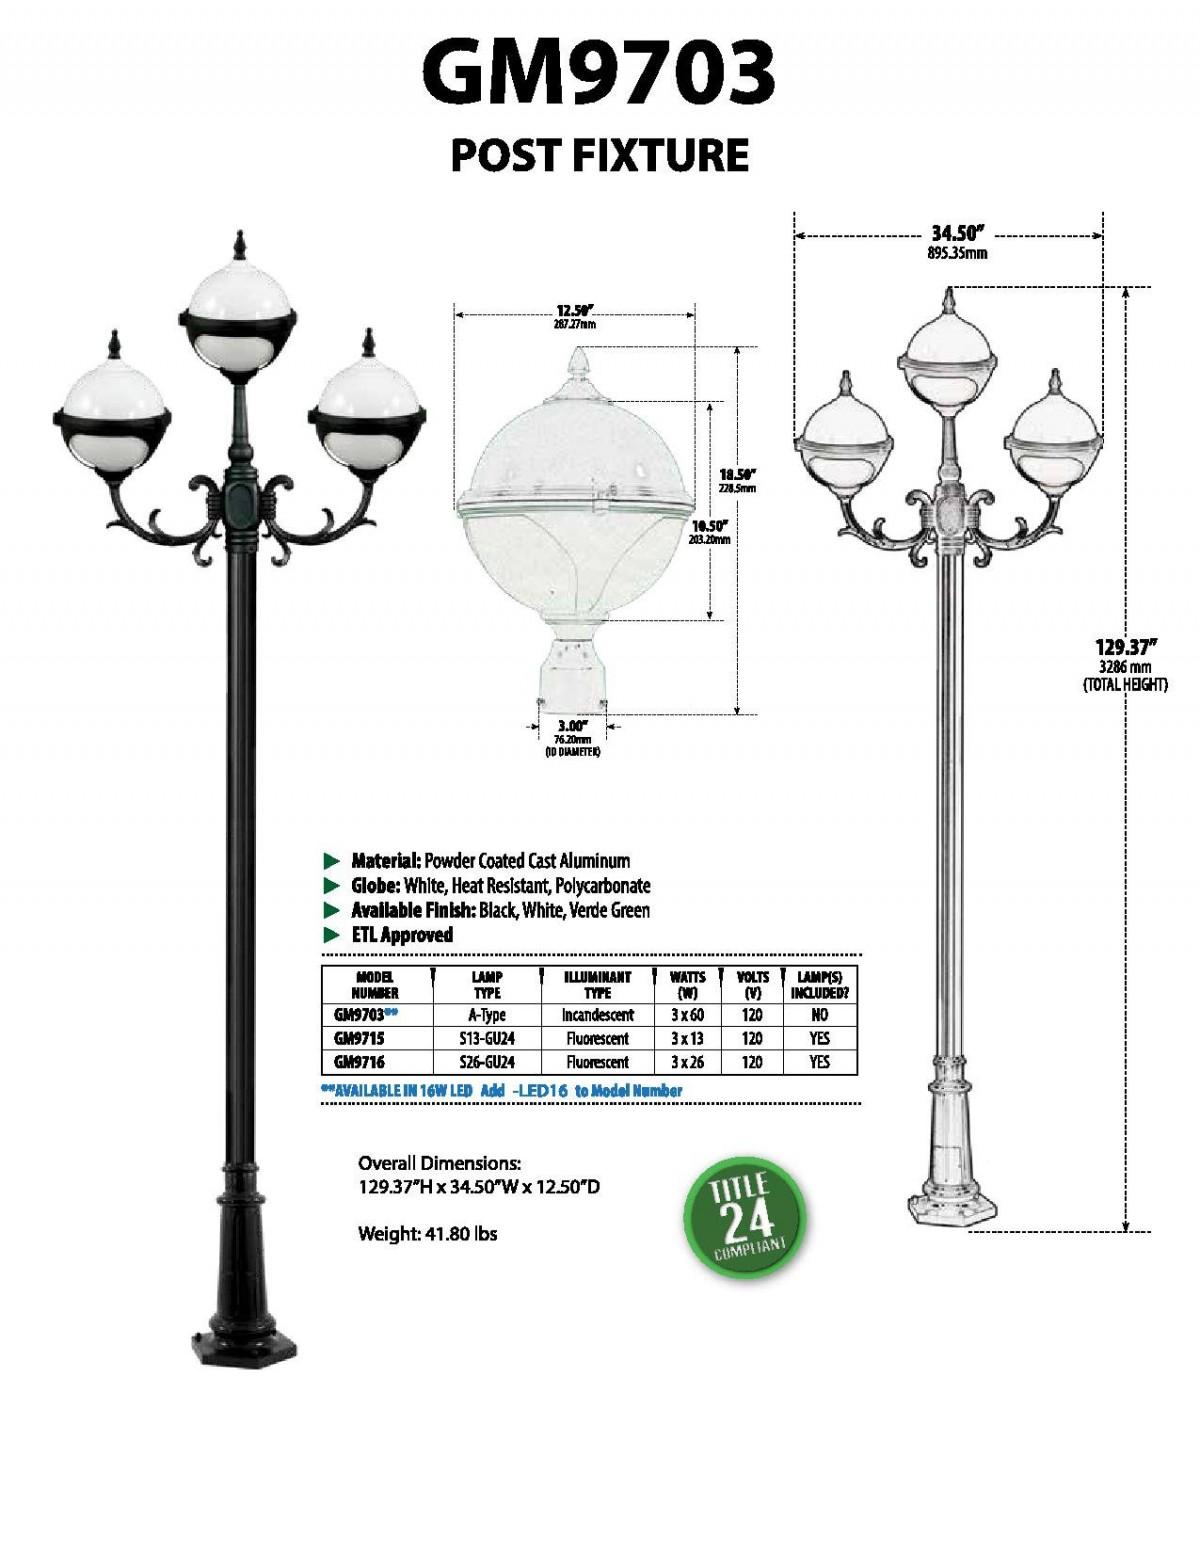 GM 9703 Powder Coated Cast Aluminum Pole Light